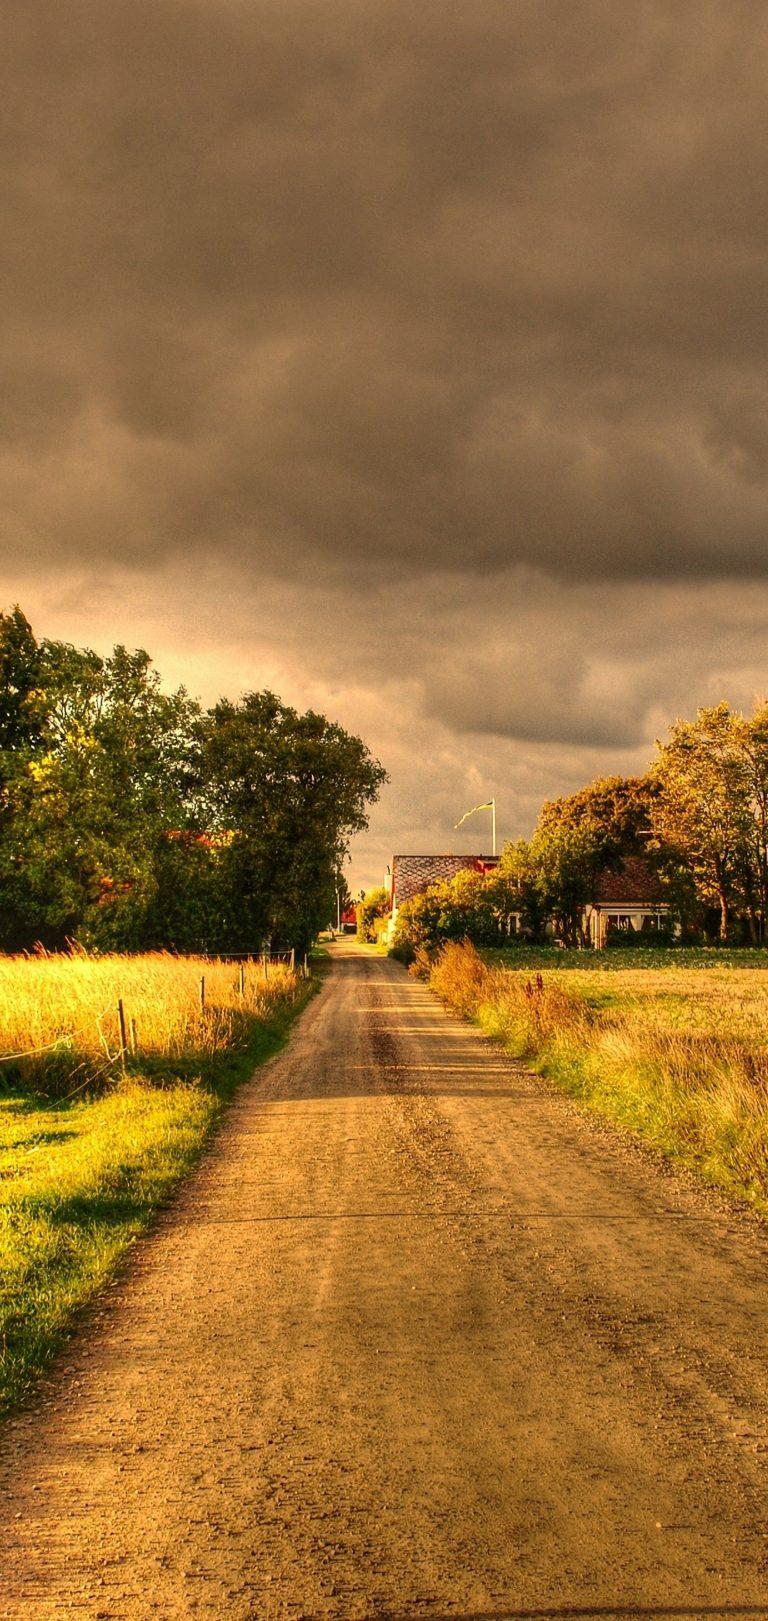 Autumn Field Road Landscape Wallpaper 1440x3040 768x1621